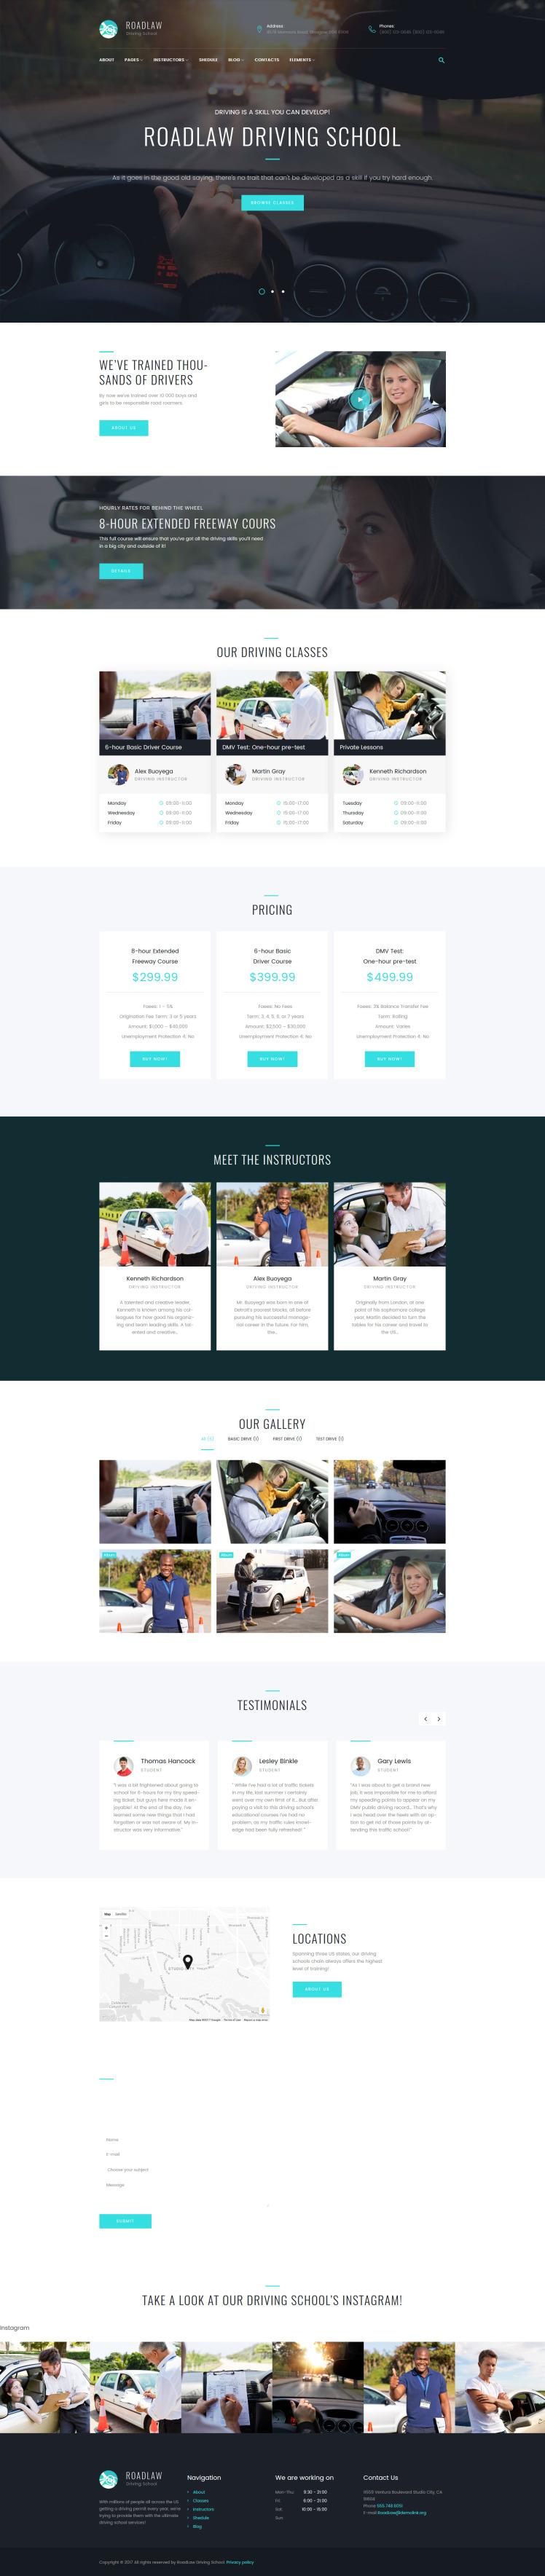 RoadLaw Driving School Responsive WordPress Theme WordPress Themes